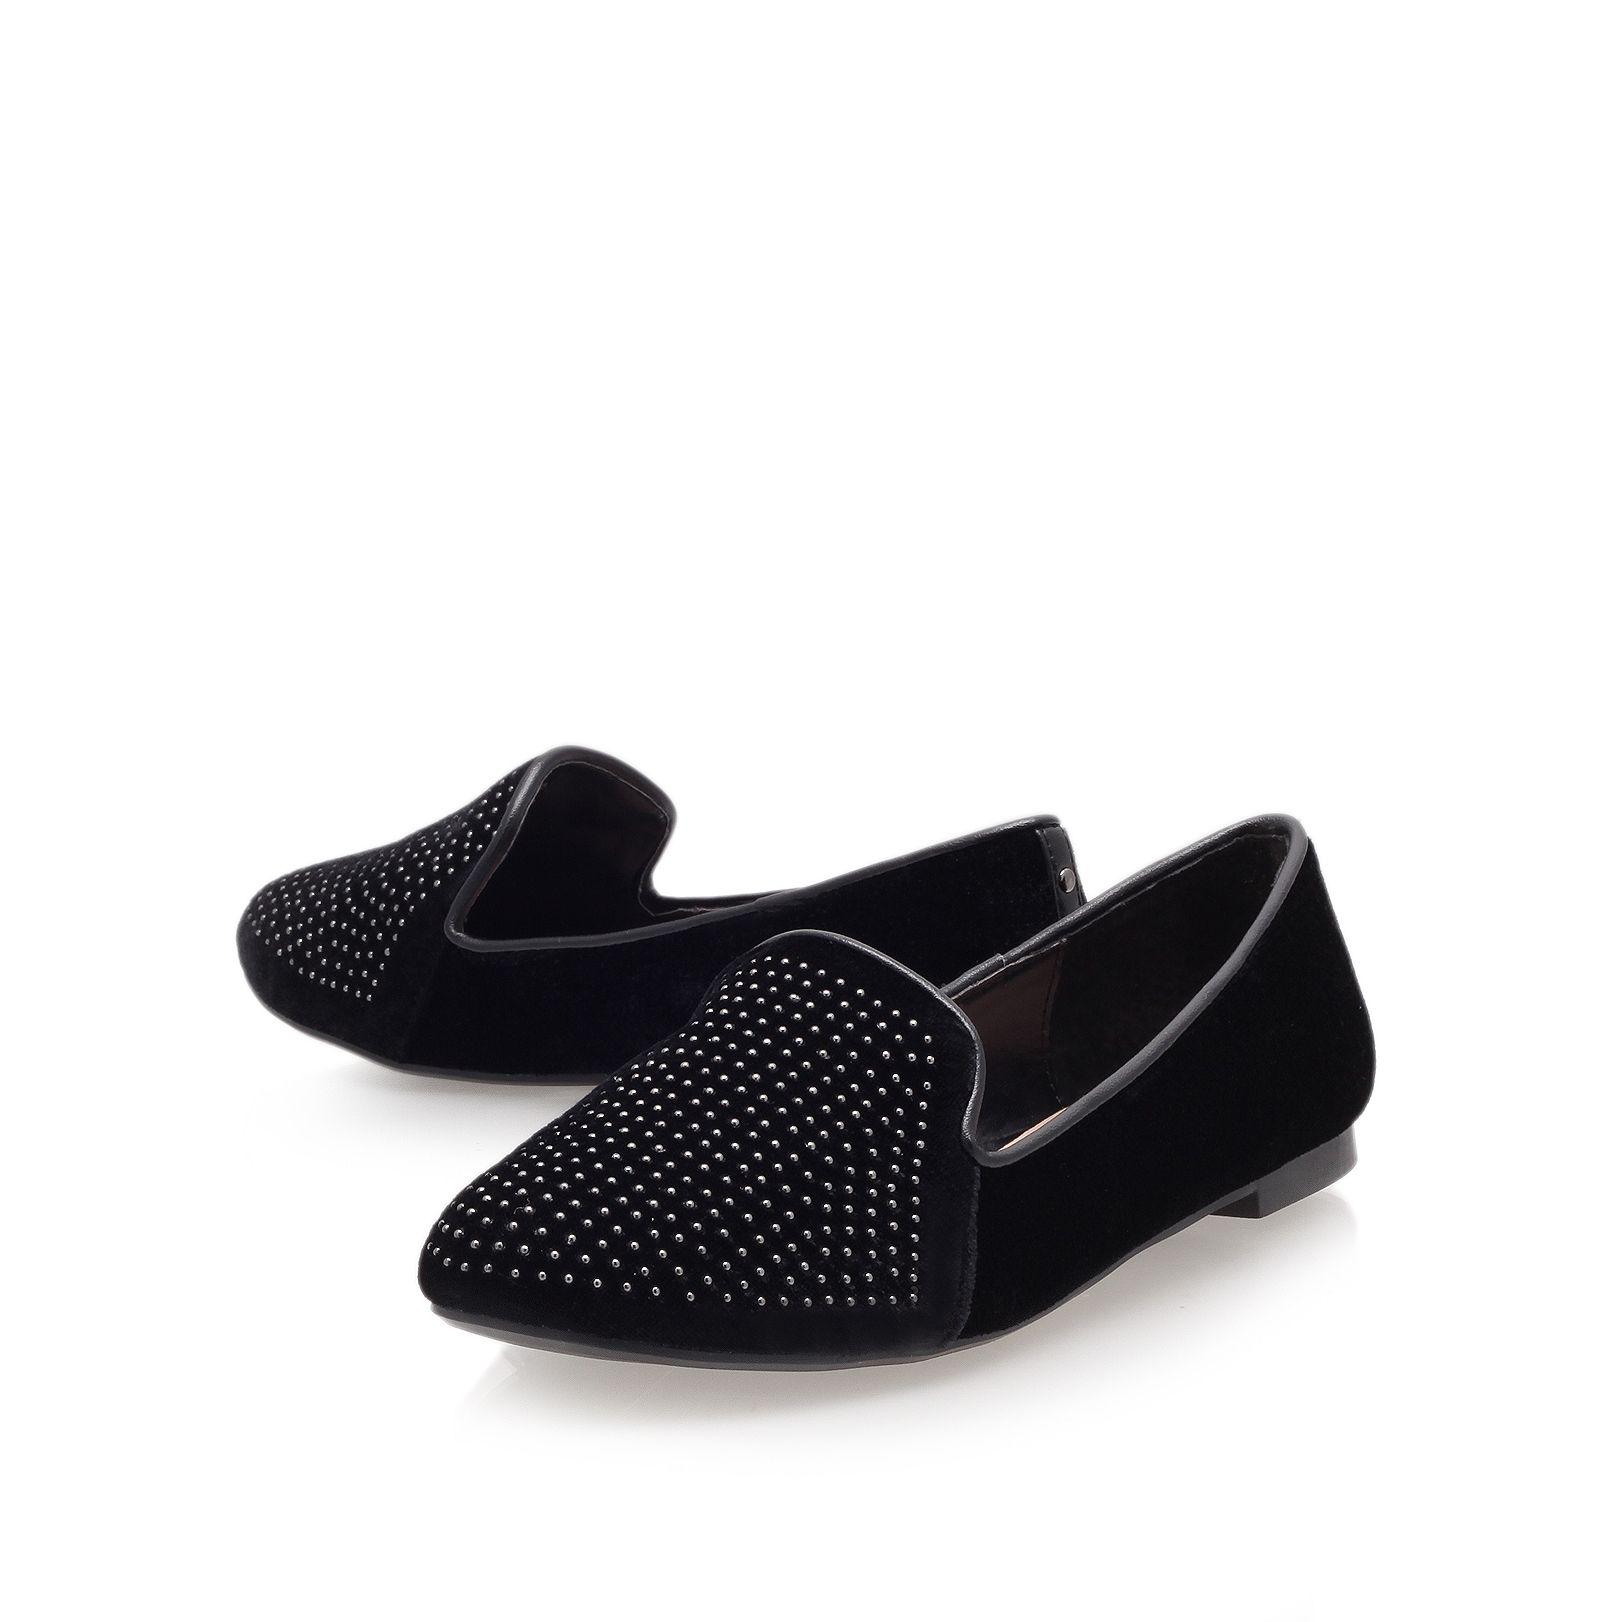 Carvela Kurt Geiger Flat Shoes